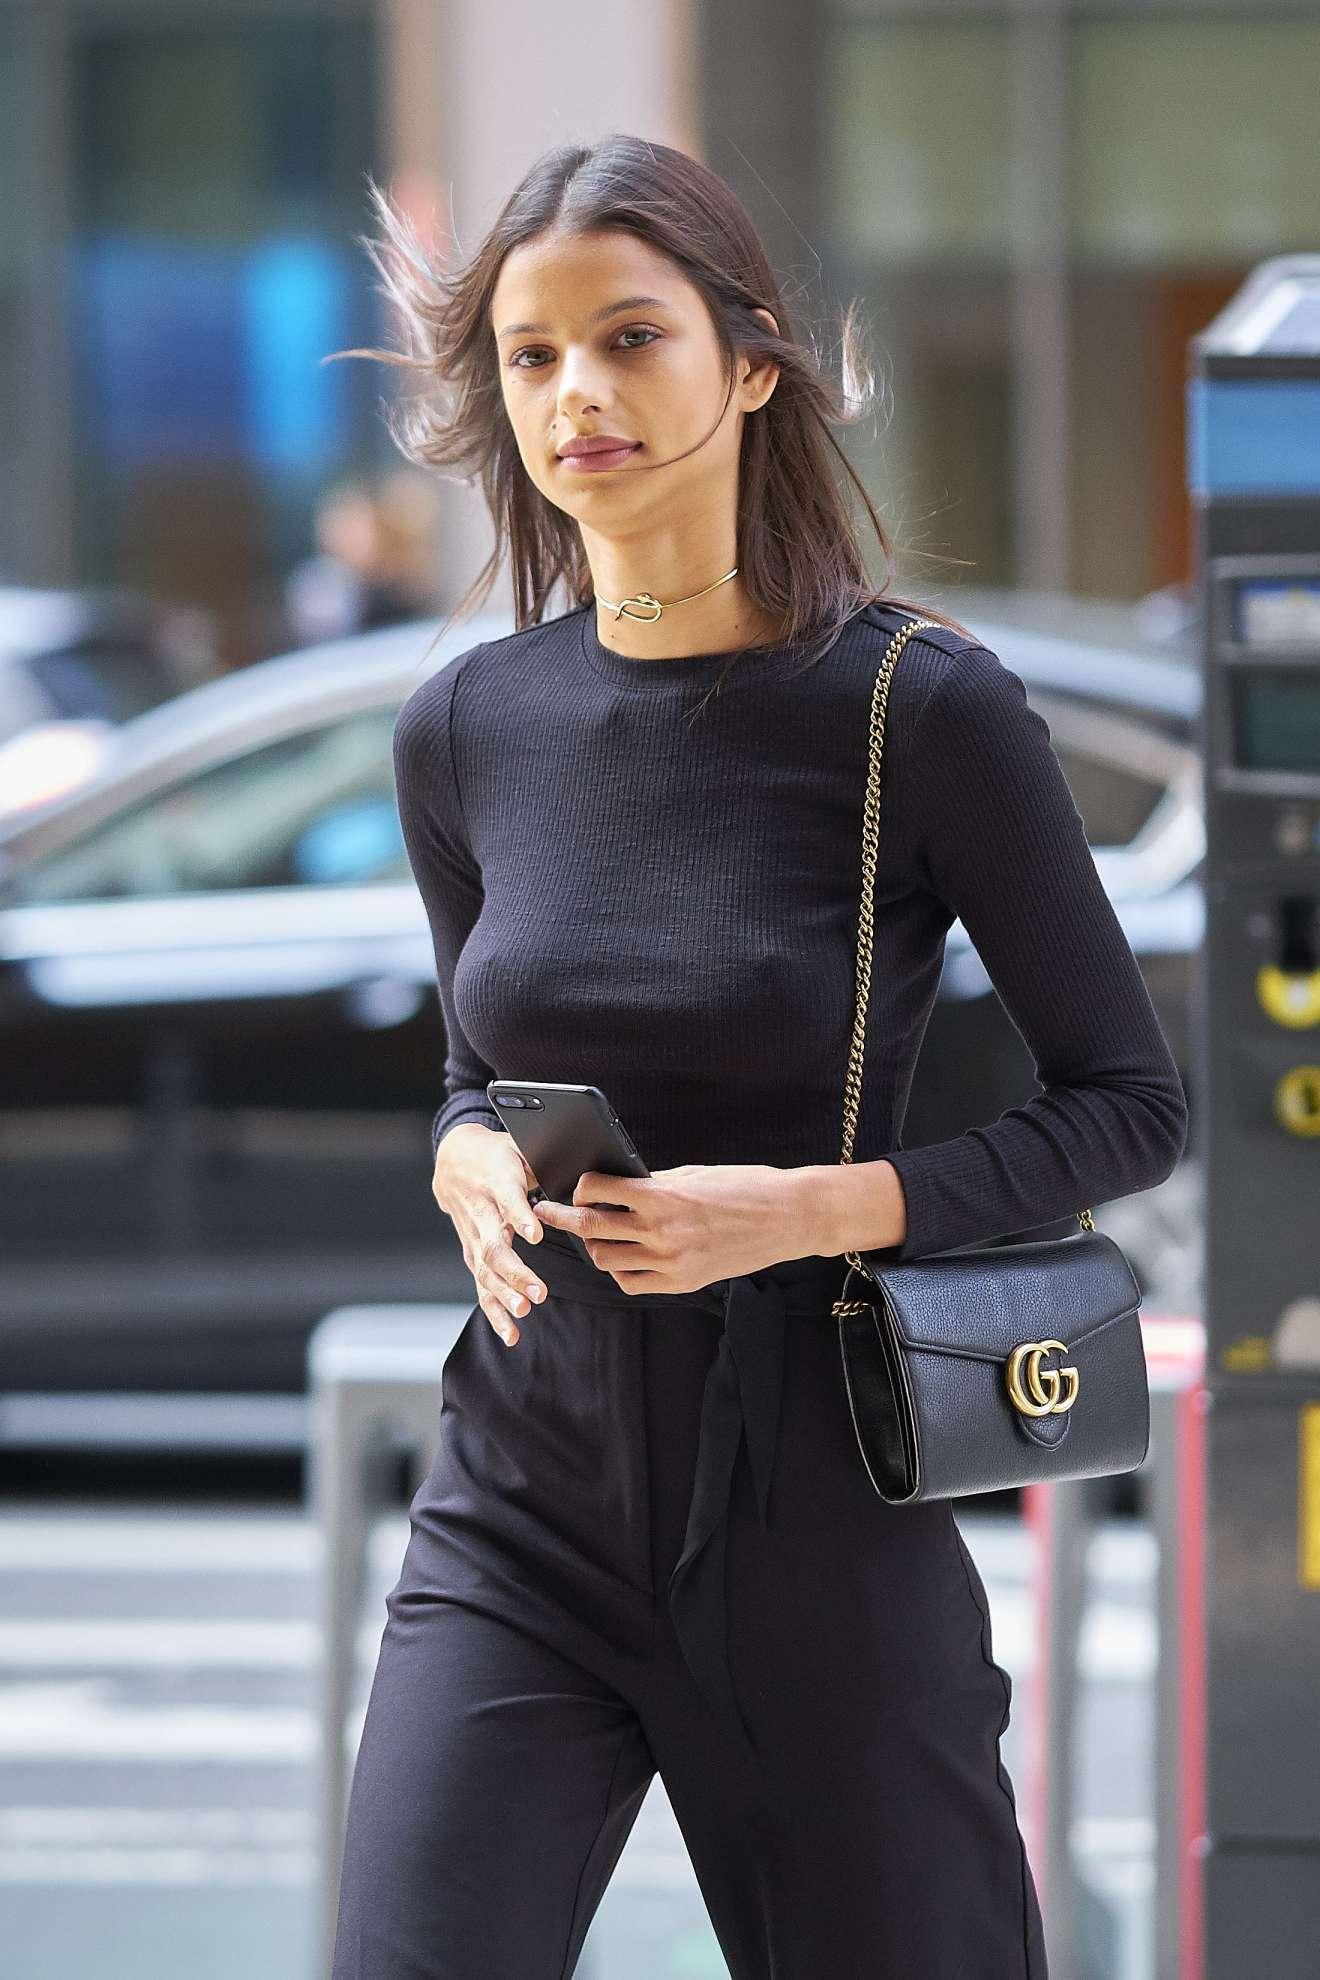 Bruna Lirio - Arrriving at Victorias Secret Fitting | GotCeleb